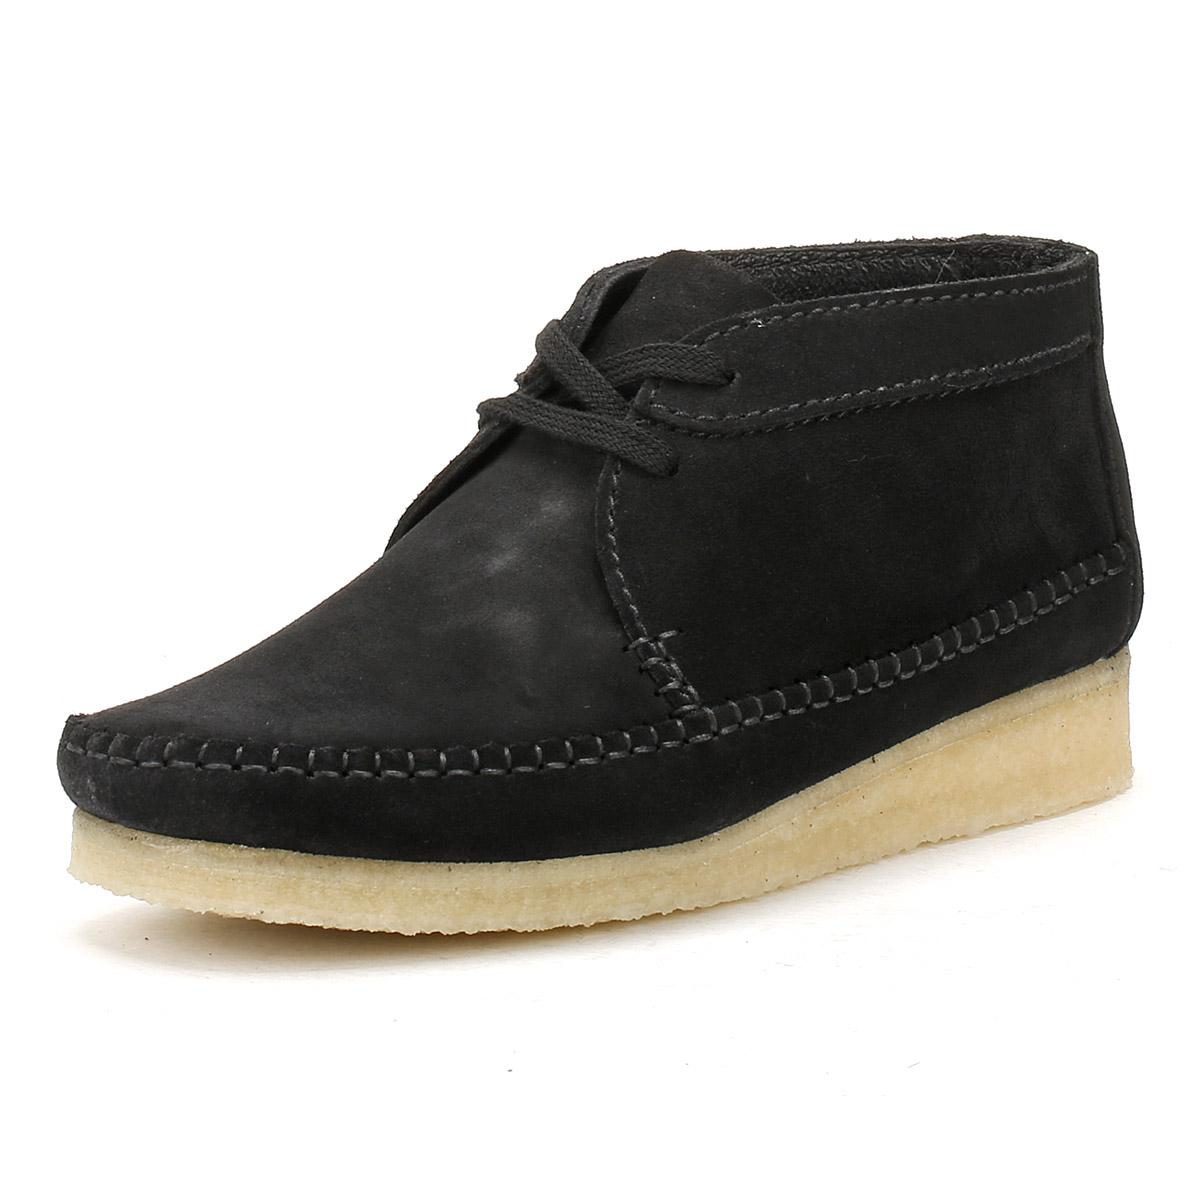 Clarks Womens Black Suede Weaver Boots